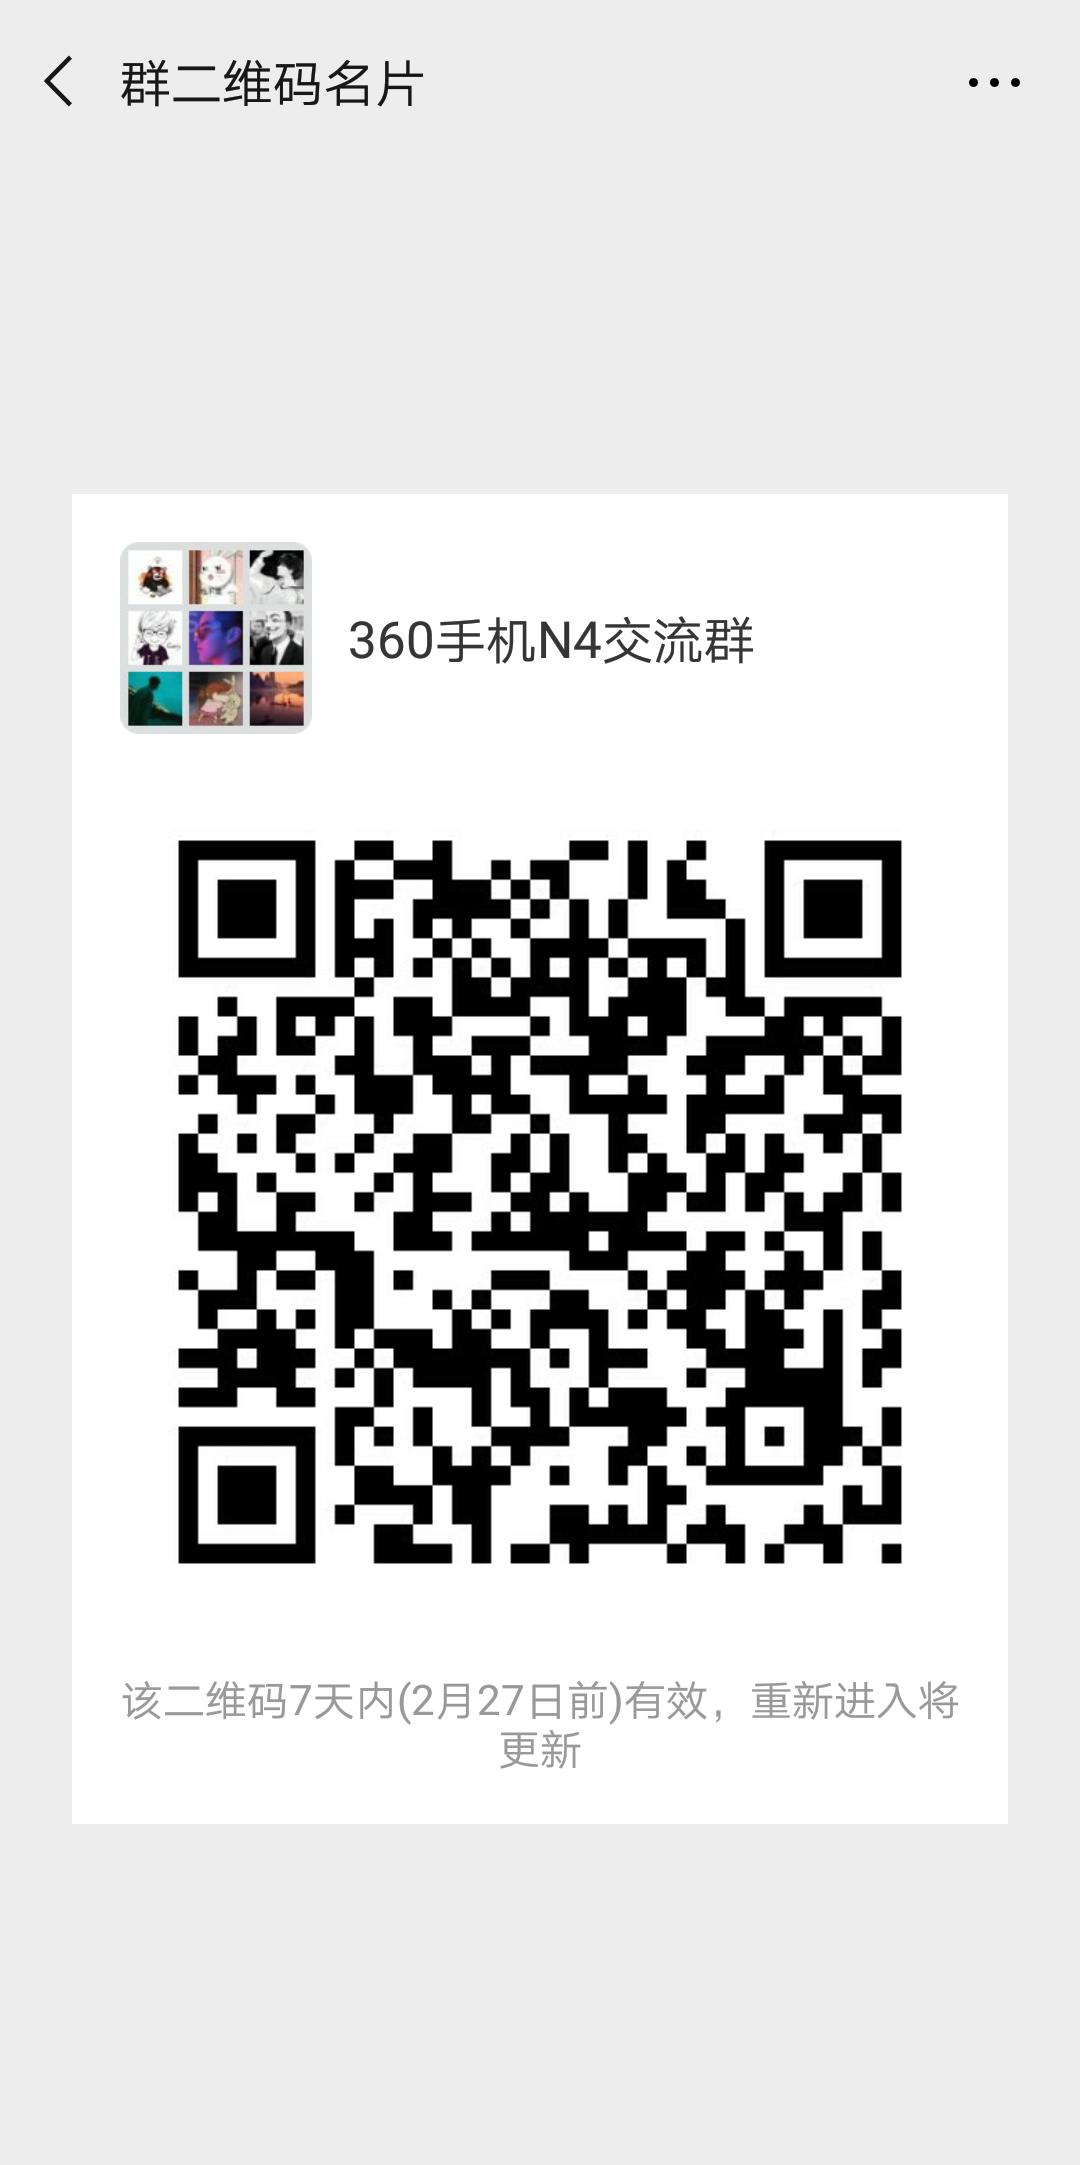 Screenshot_2019-02-20-19-11-08-2113353975.png